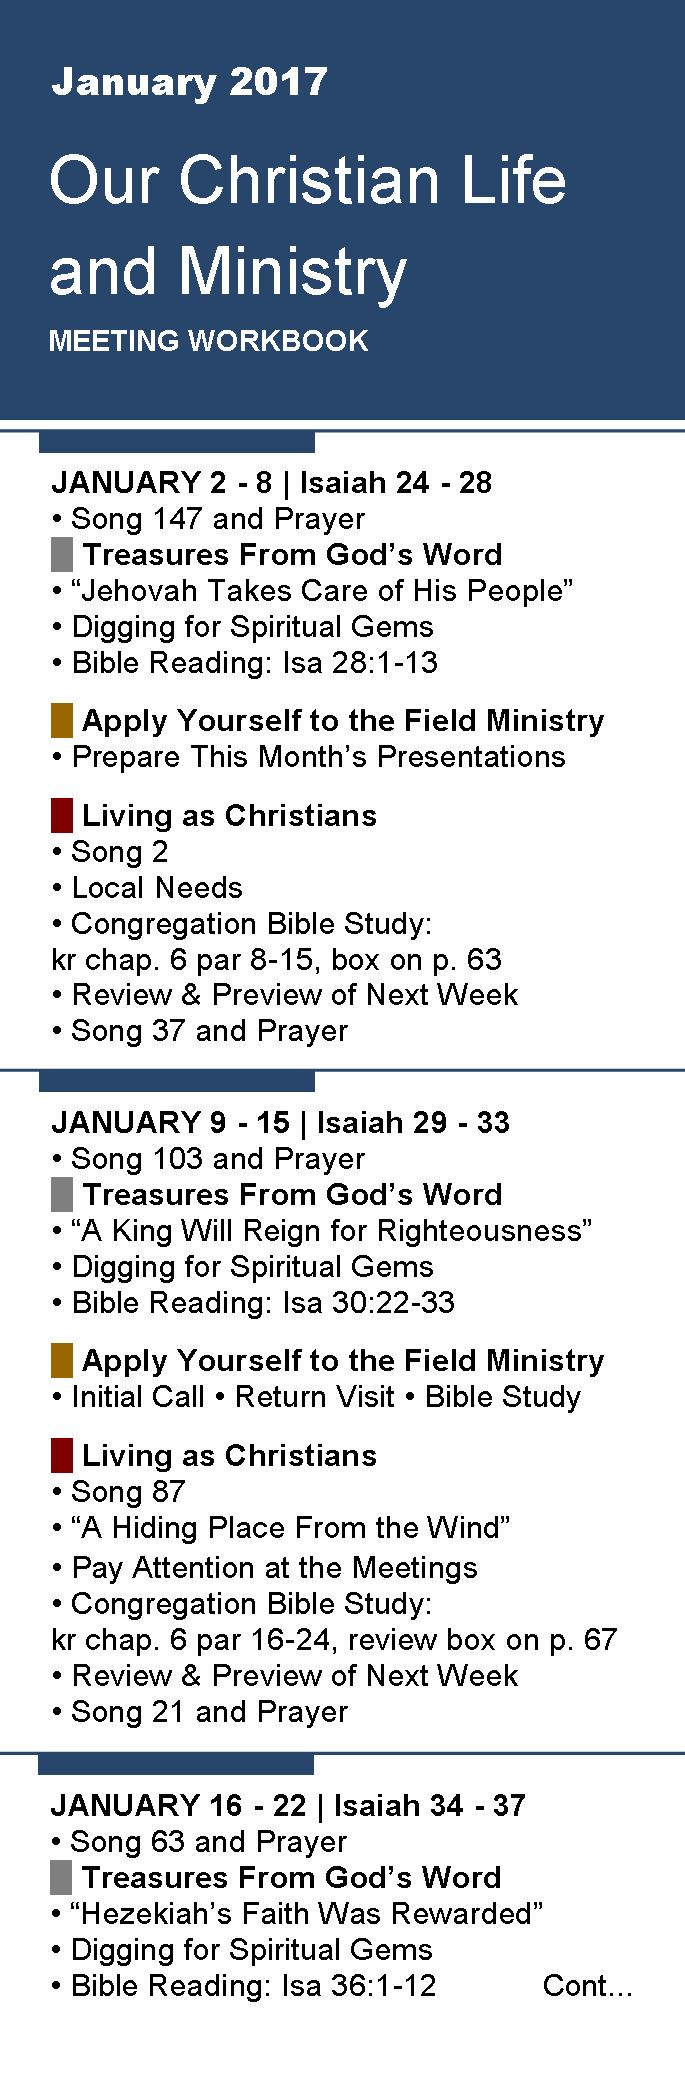 Workbooks prayer workbook : Free Bookmarks for Meeting Workbook JANUARY 2017 - Jehovah's ...